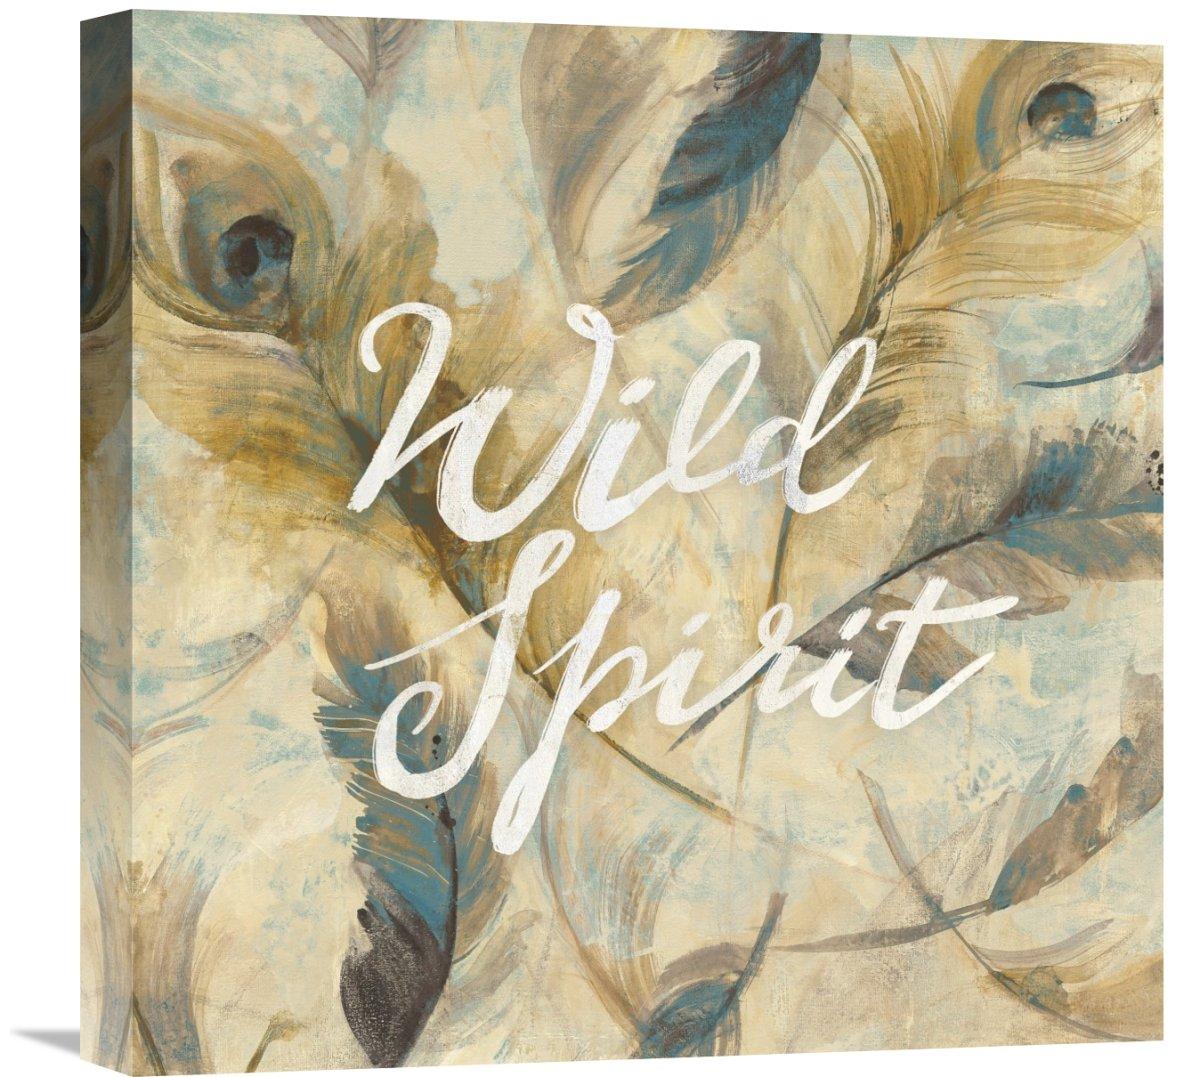 Global GalleryAlbena Hristova Into The Wild I Giclee Stretched Canvas Artwork 18 x 18